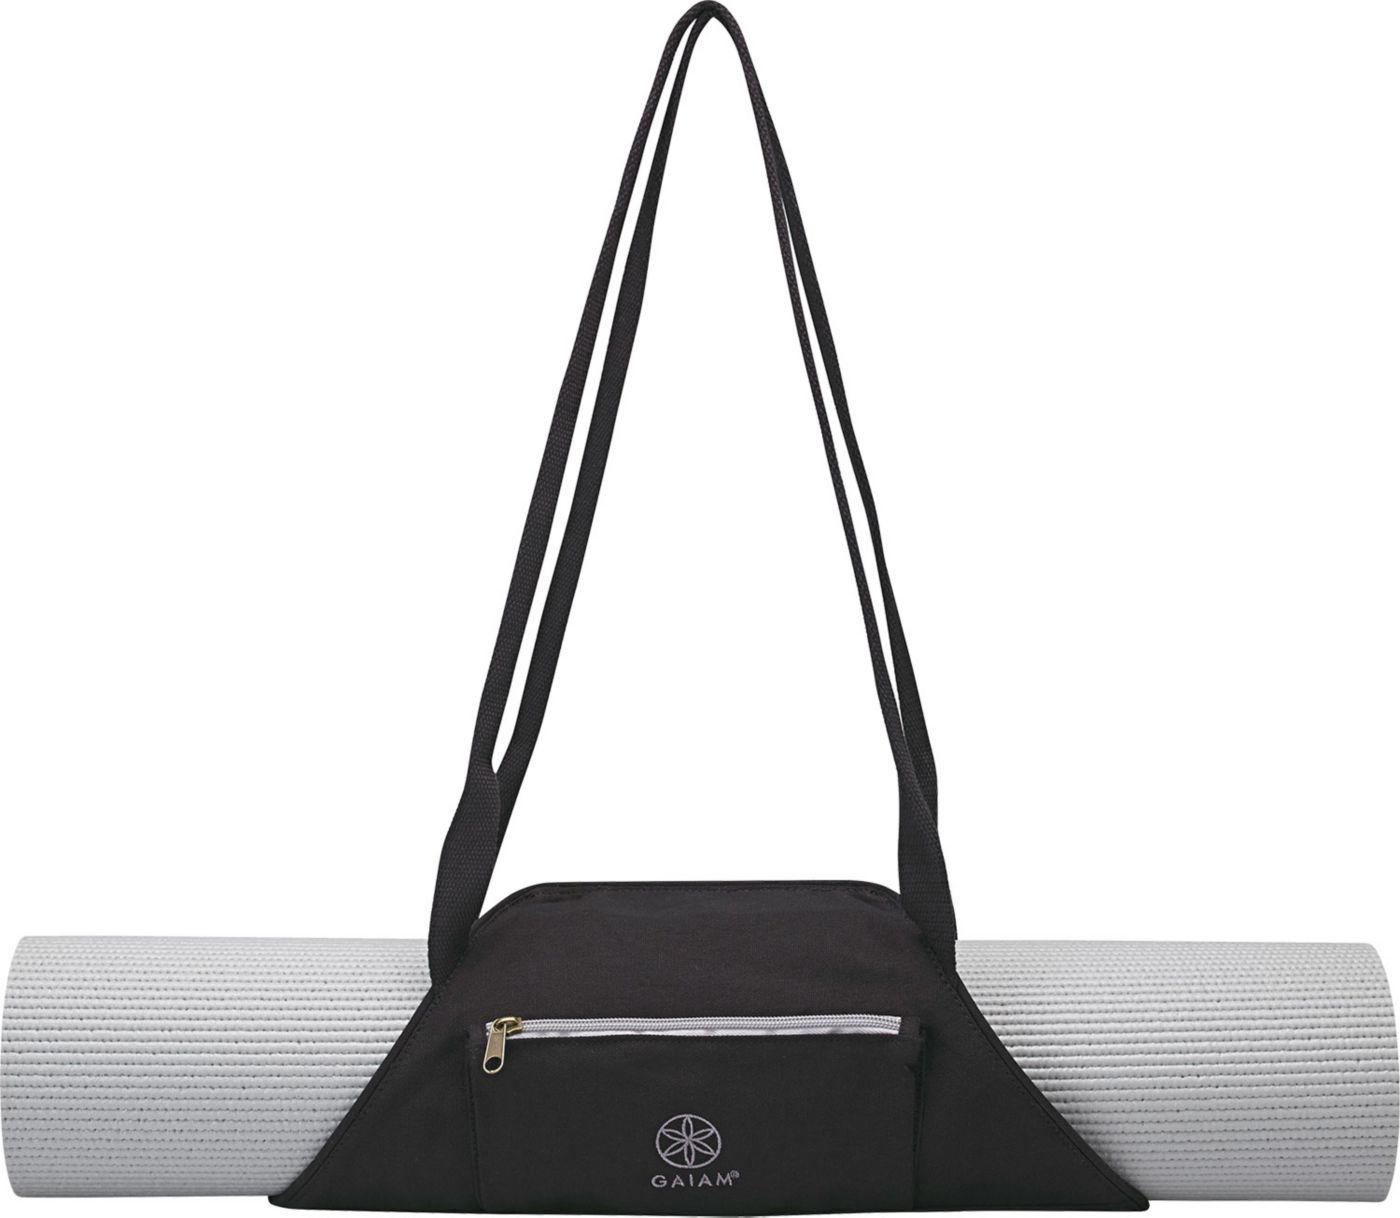 Gaiam On-the-Go Yoga Mat Bag